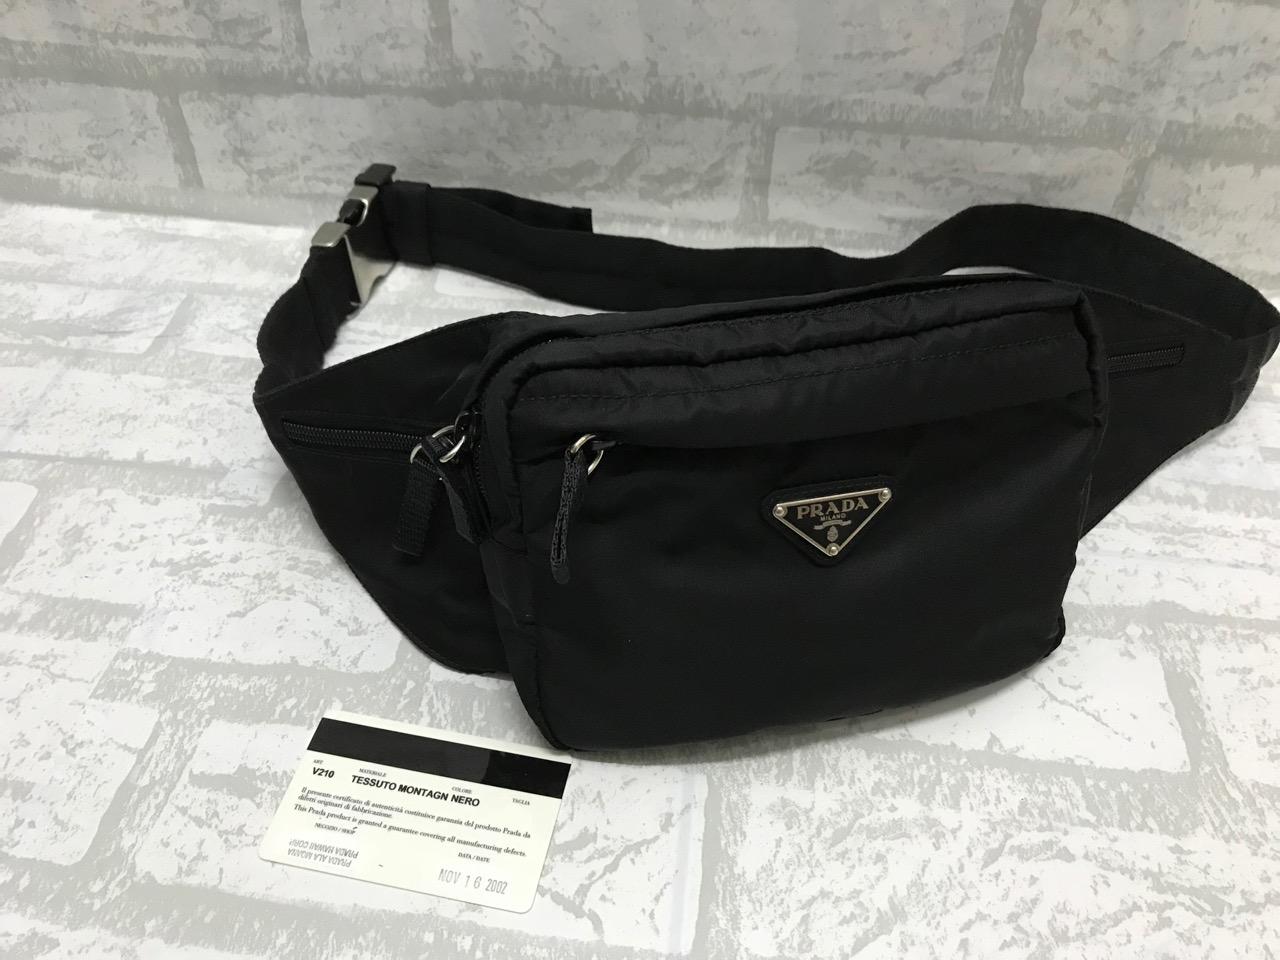 7261fbb7563c Prada Prada Nylon Waist Bag Size one size - Bags & Luggage for Sale -  Grailed